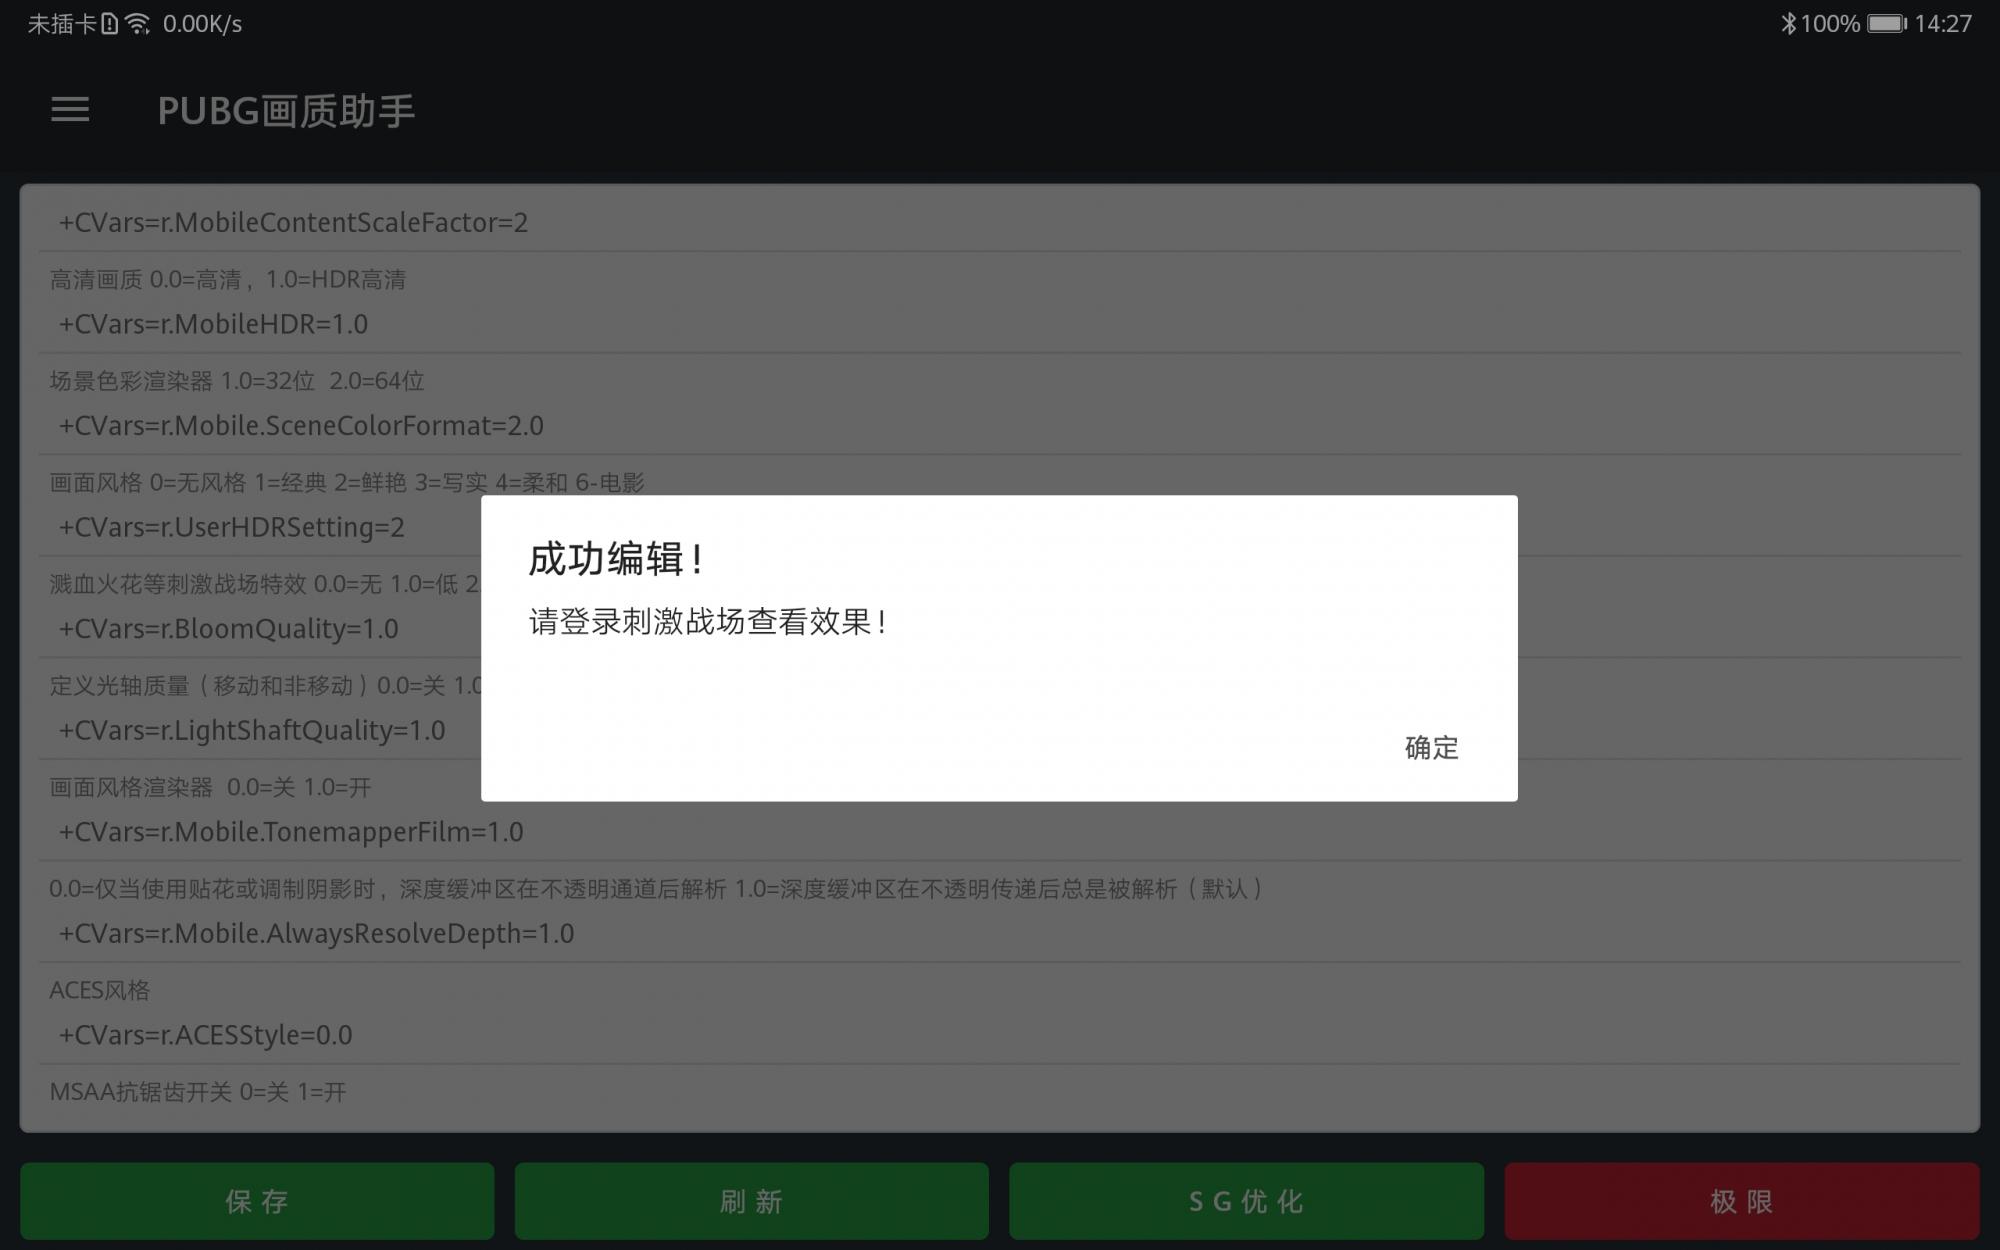 Screenshot_20190822_142708_com.pubg.change.jpg